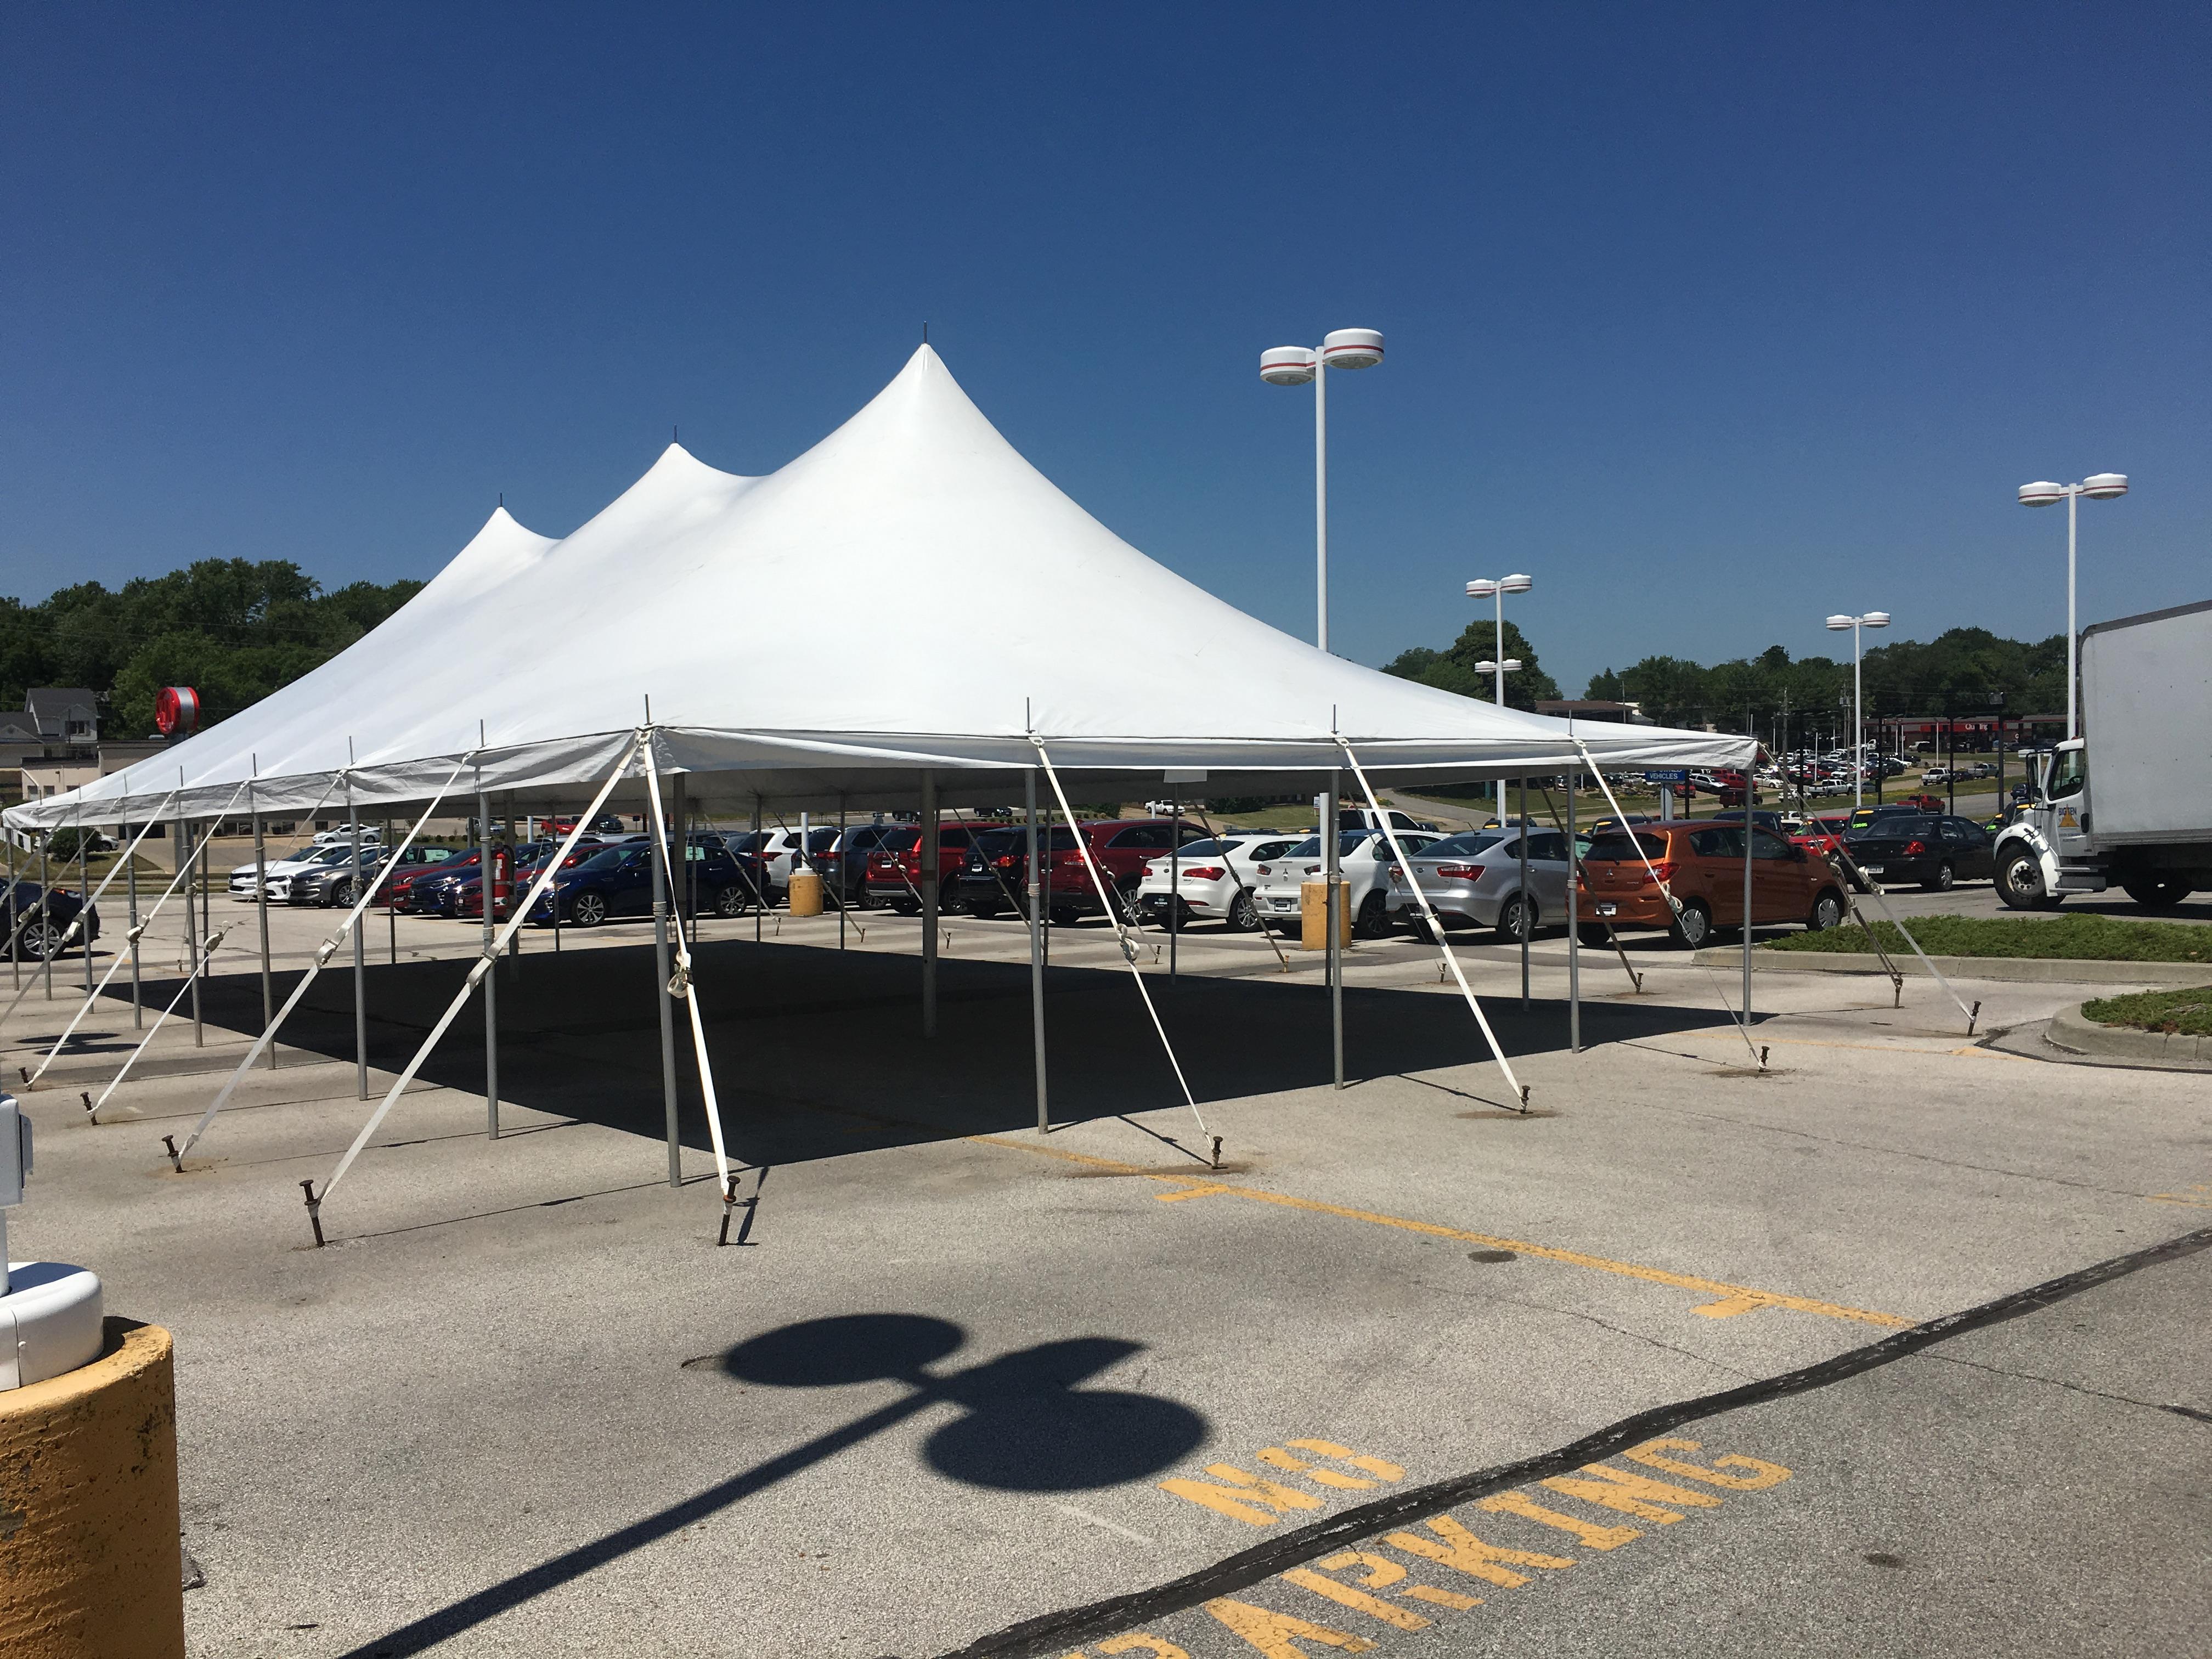 Setup for car dealership tent sale for Kia Motors in Des Moines